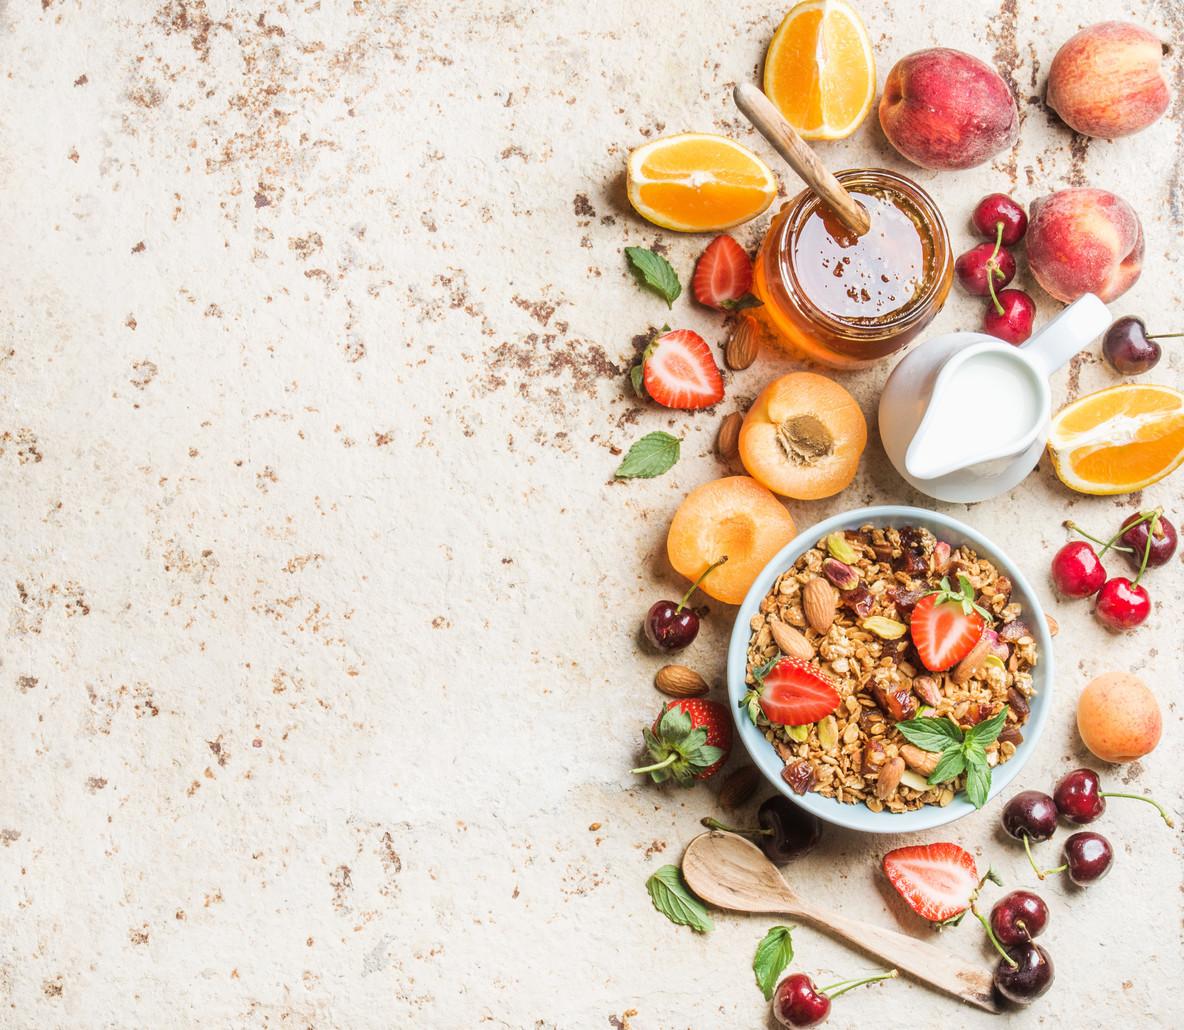 Healthy breakfast ingredients  Bowl of oat granola with milk  fresh fruit  berries and honey